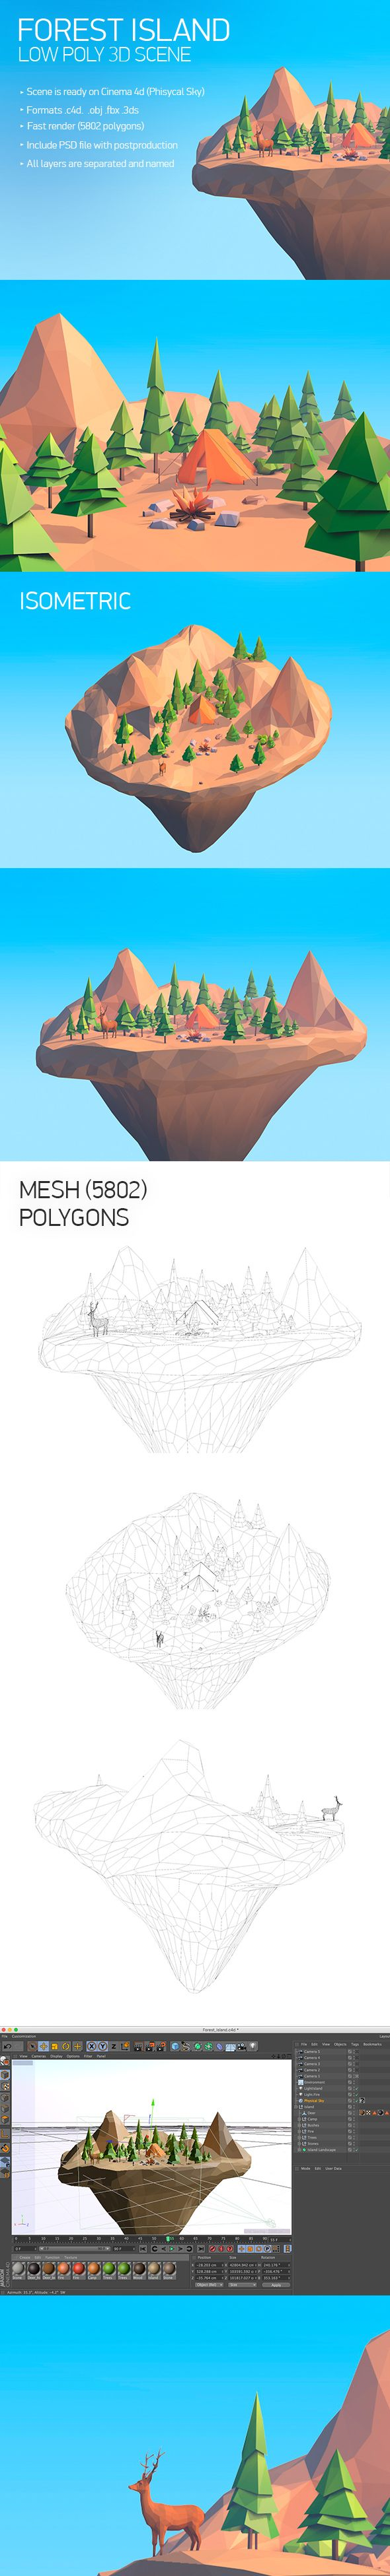 Low Poly Forest island 3D Models Design Template #cinema4d #3D #3dDesign Download here: https://3docean.net/item/forest-island/14656961?ref=yinkira